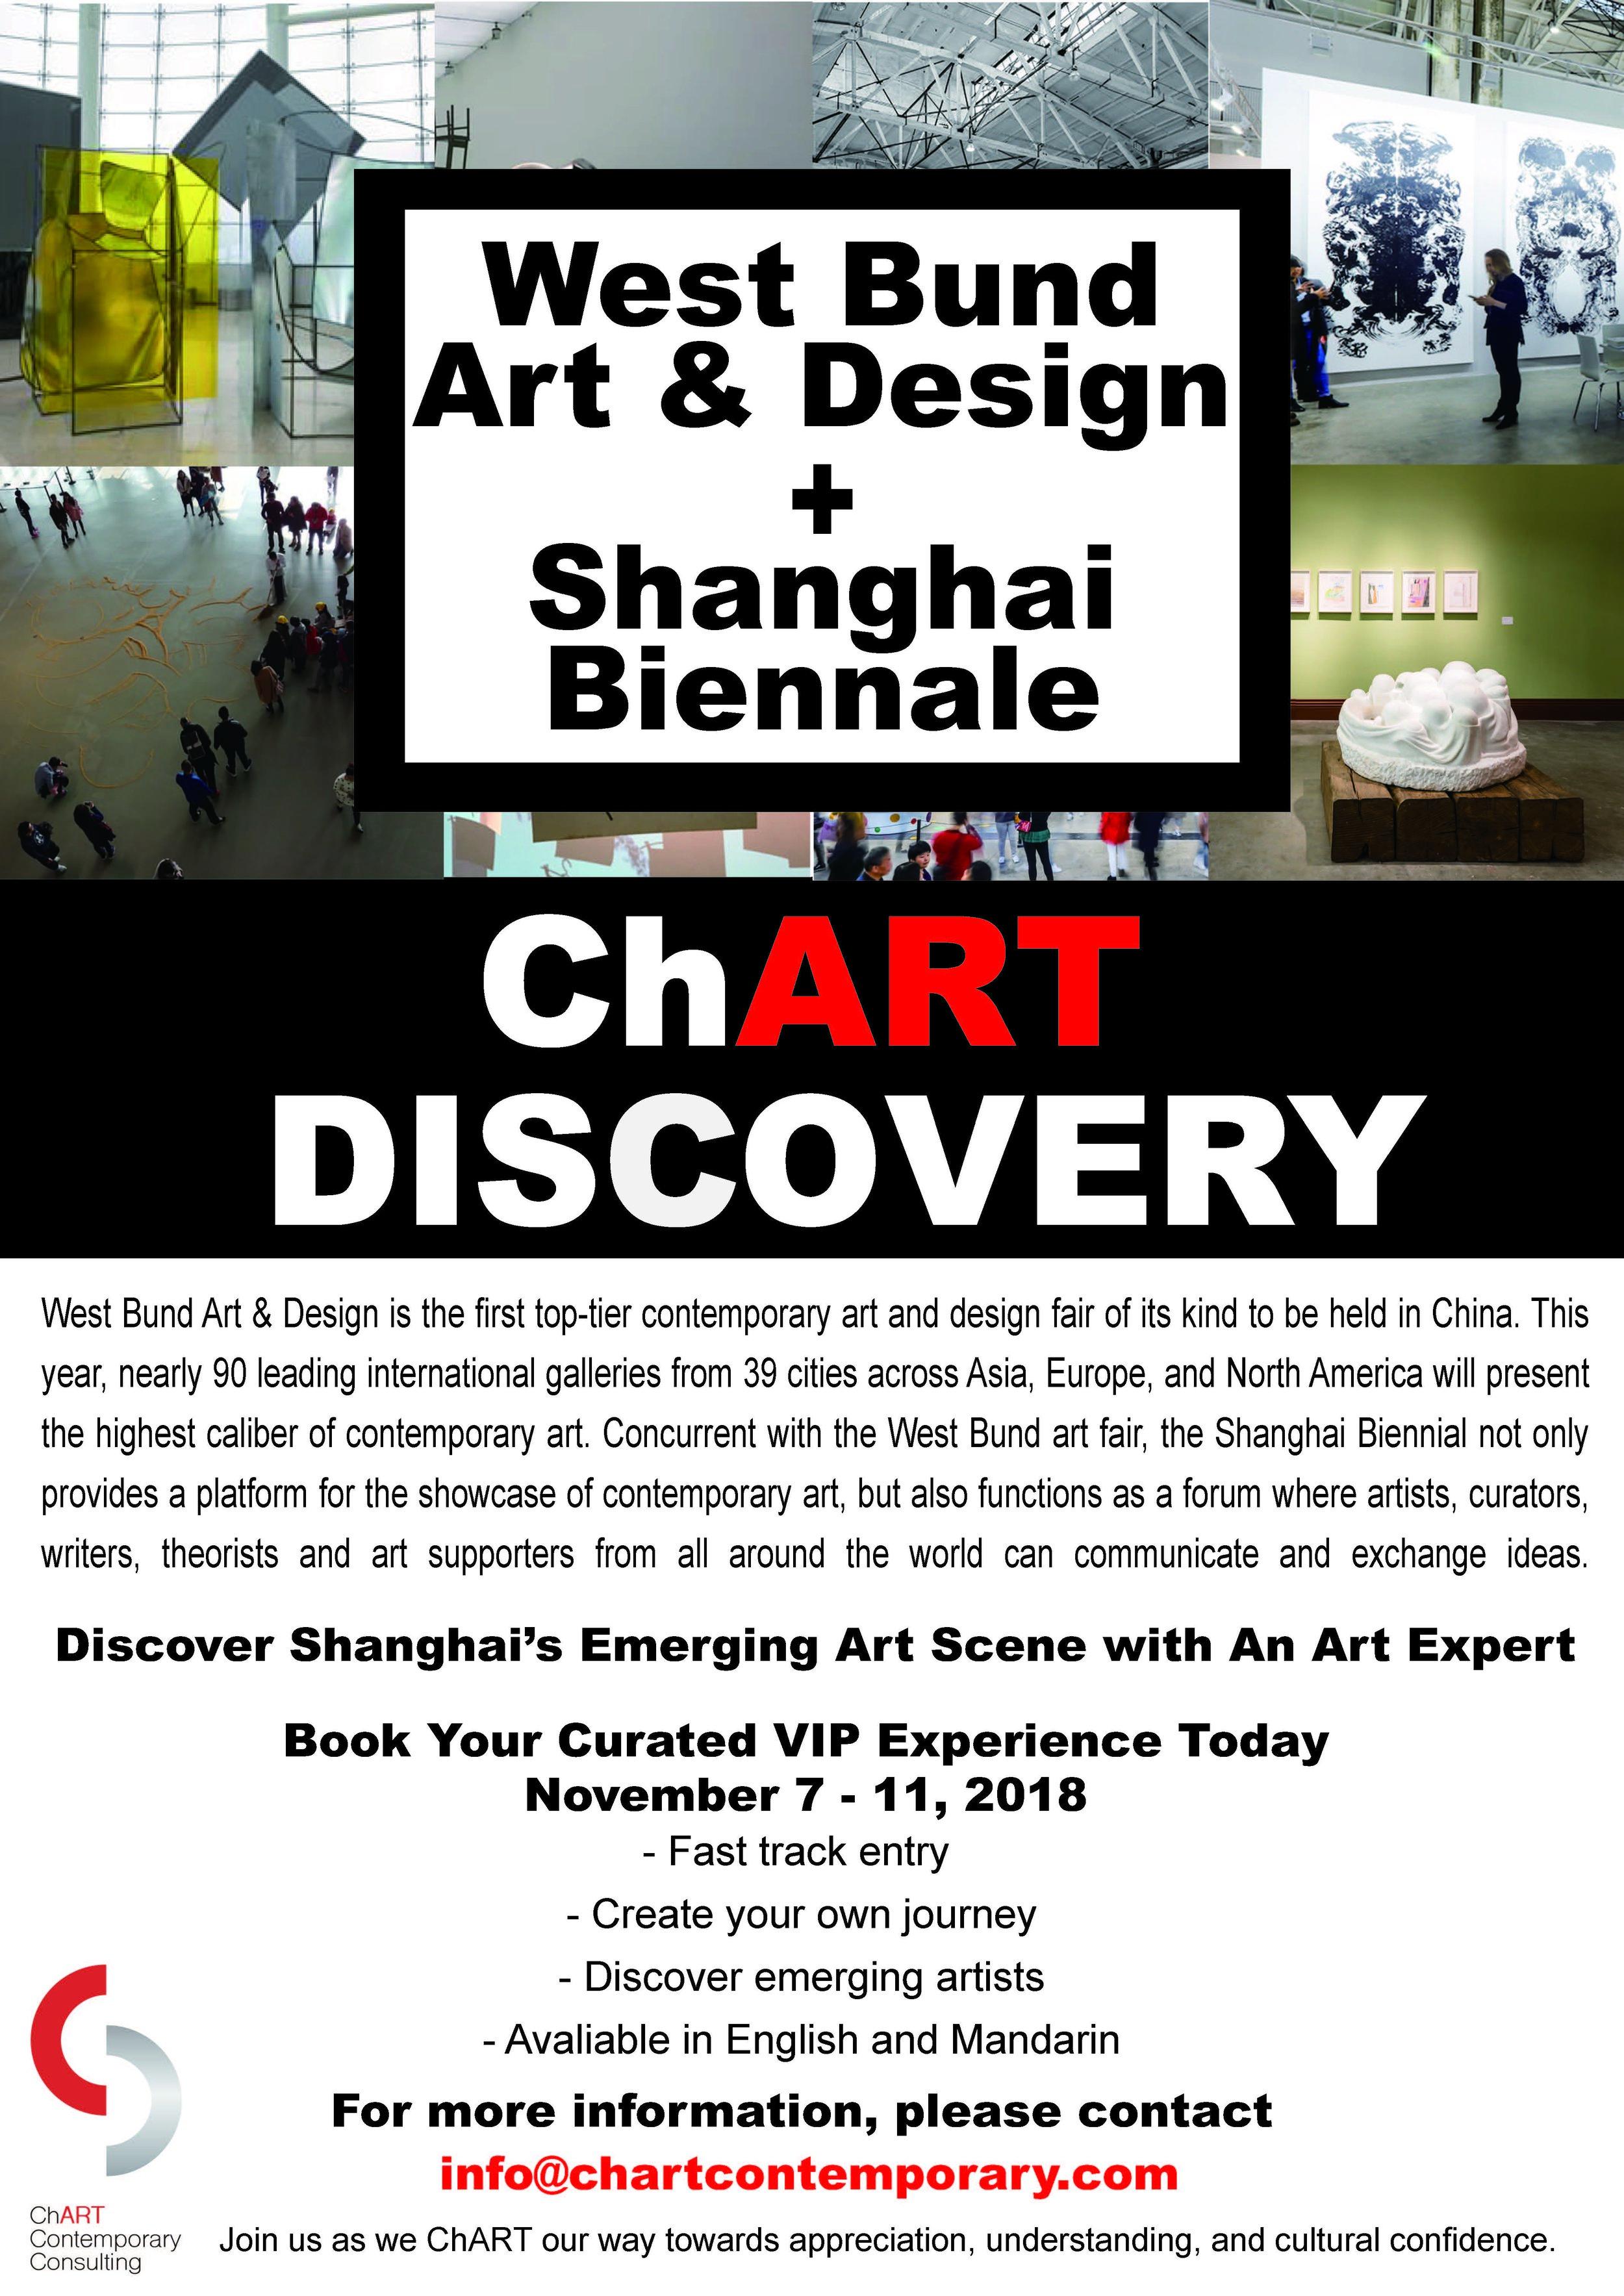 Shanghai West Bund and Biennale Discovery Tour 2018 Flyer (1).jpg